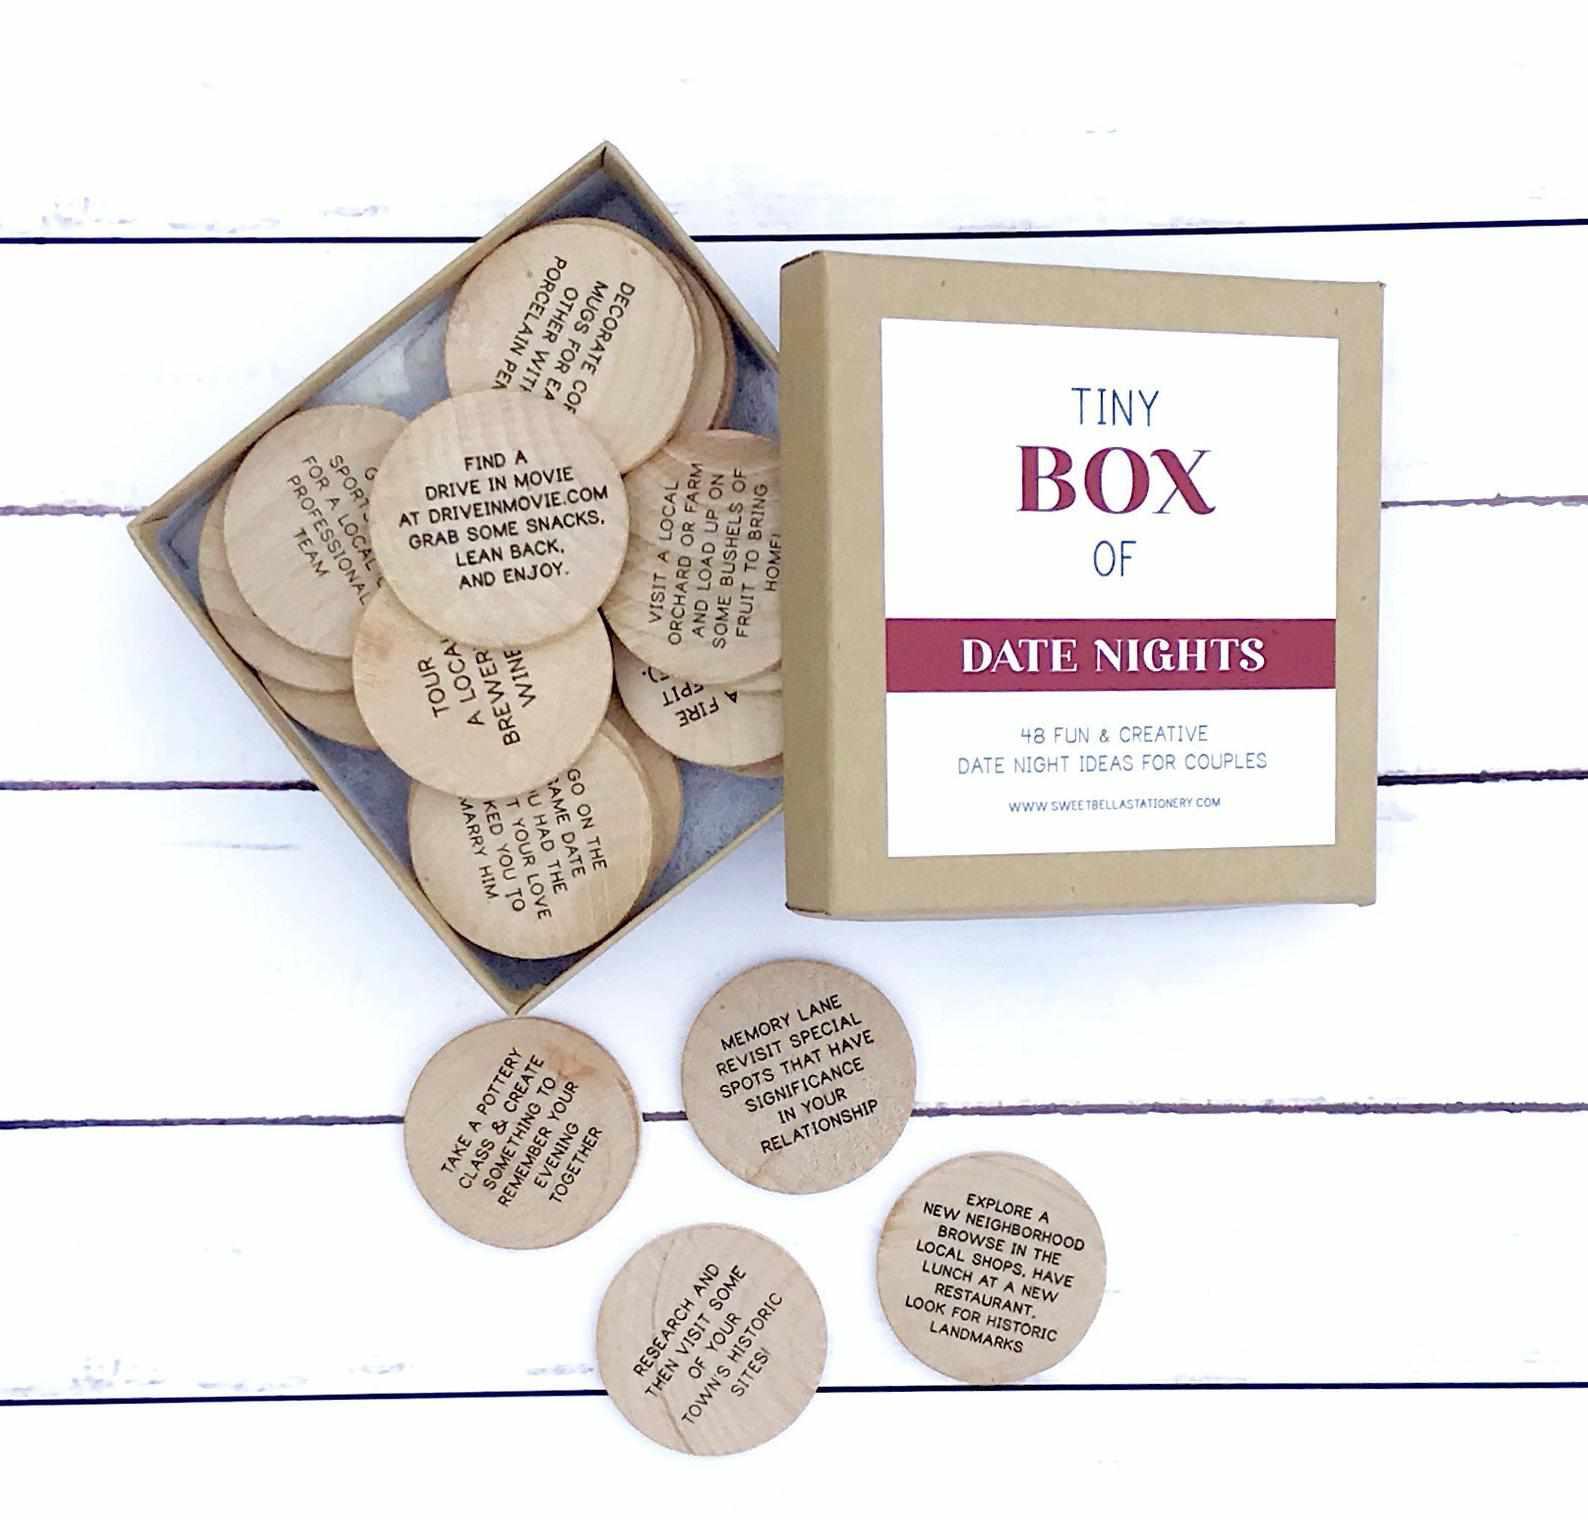 Etsy Tiny Box of Date Nights